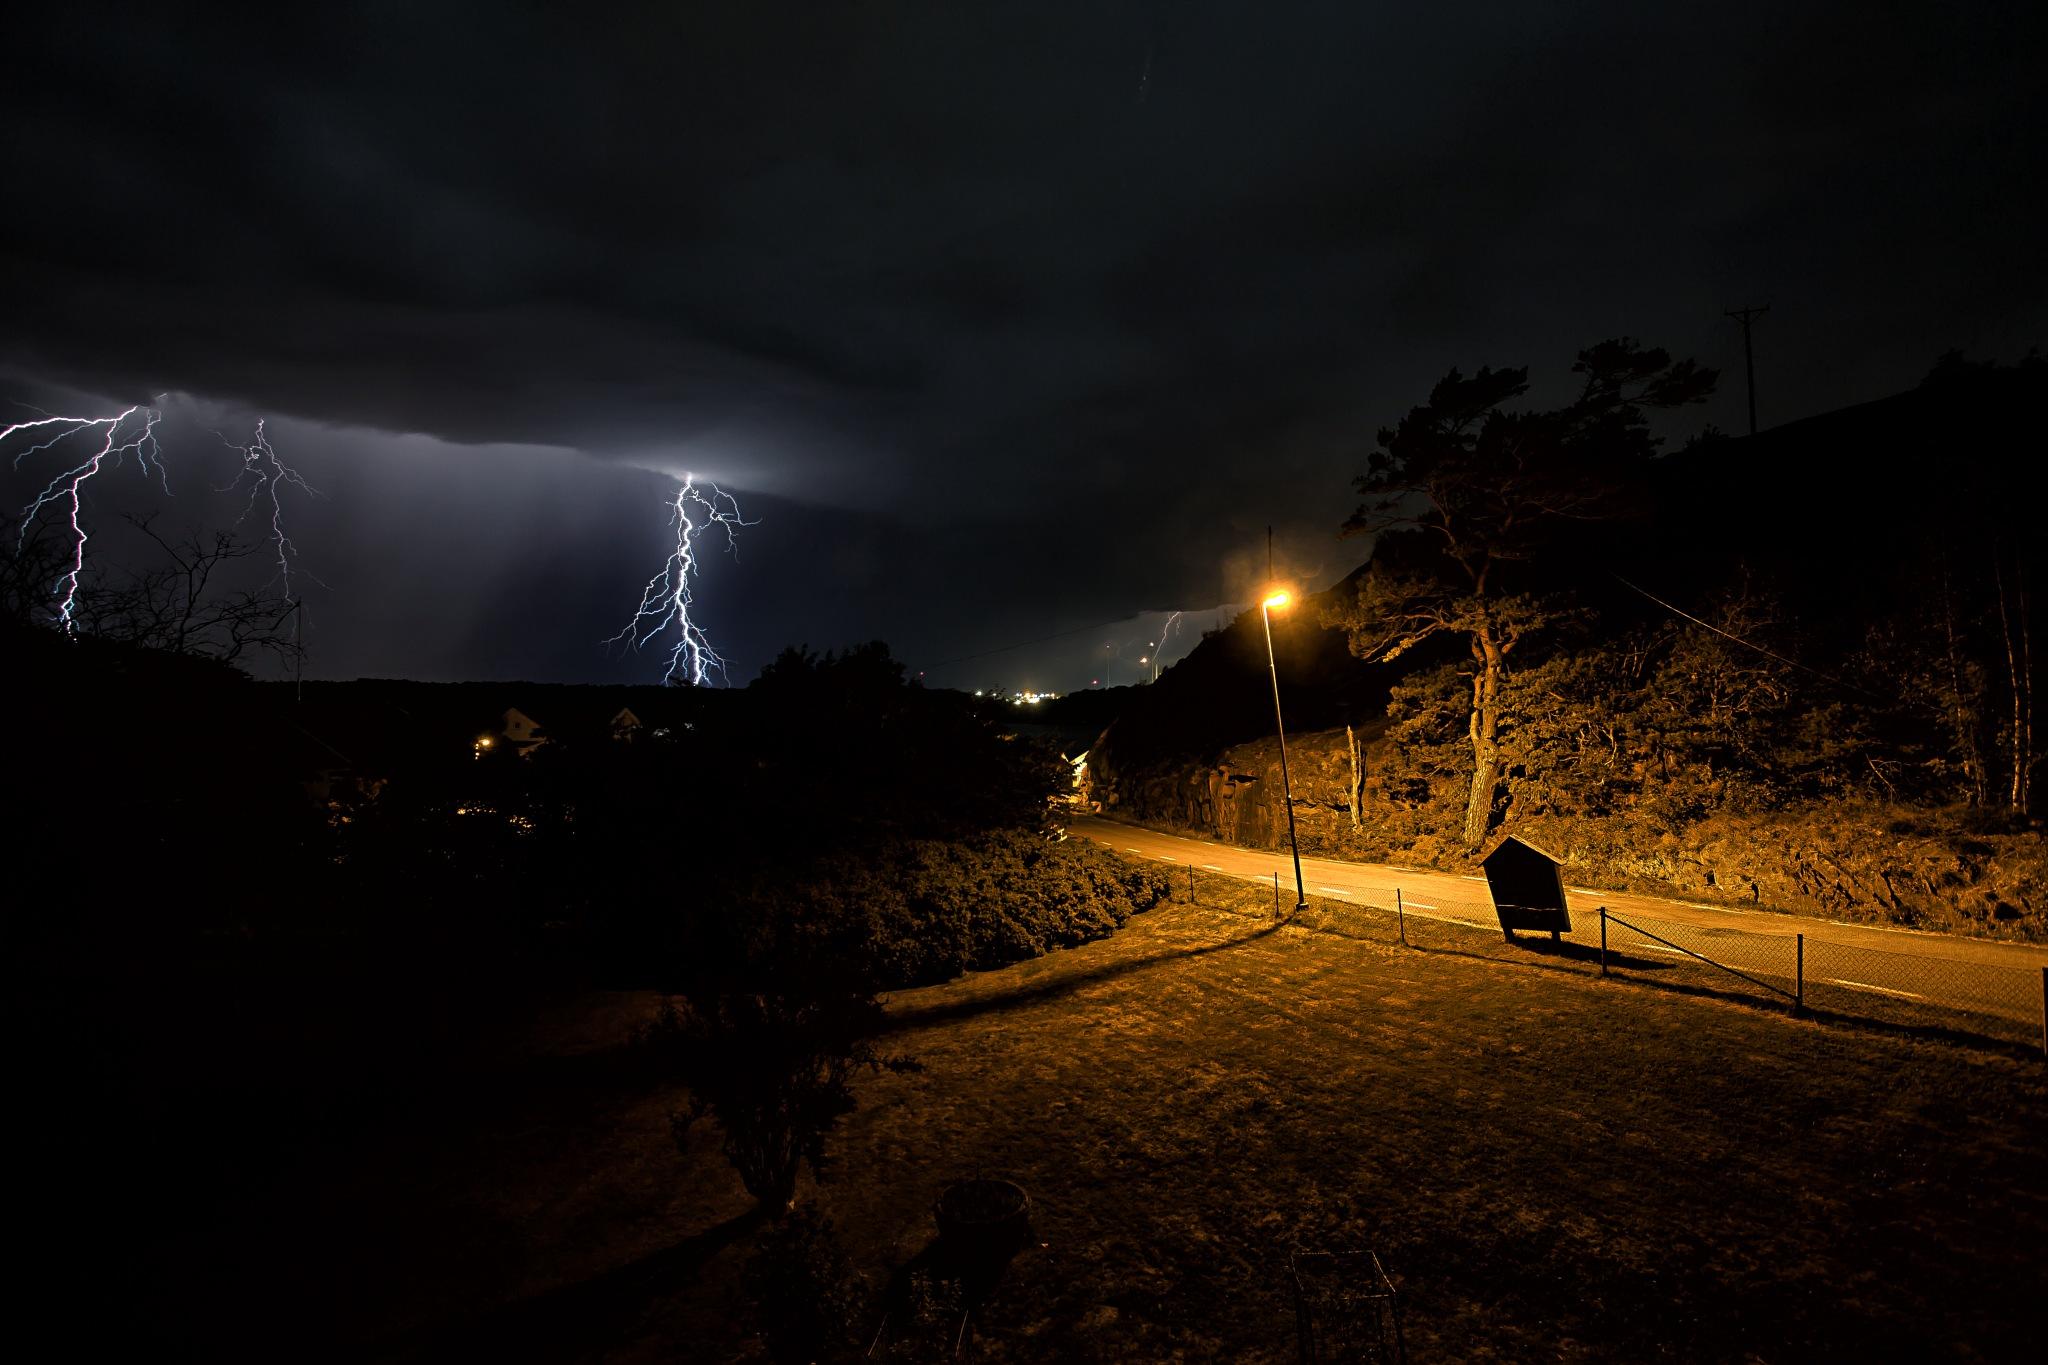 Thunder by idaeliasson88